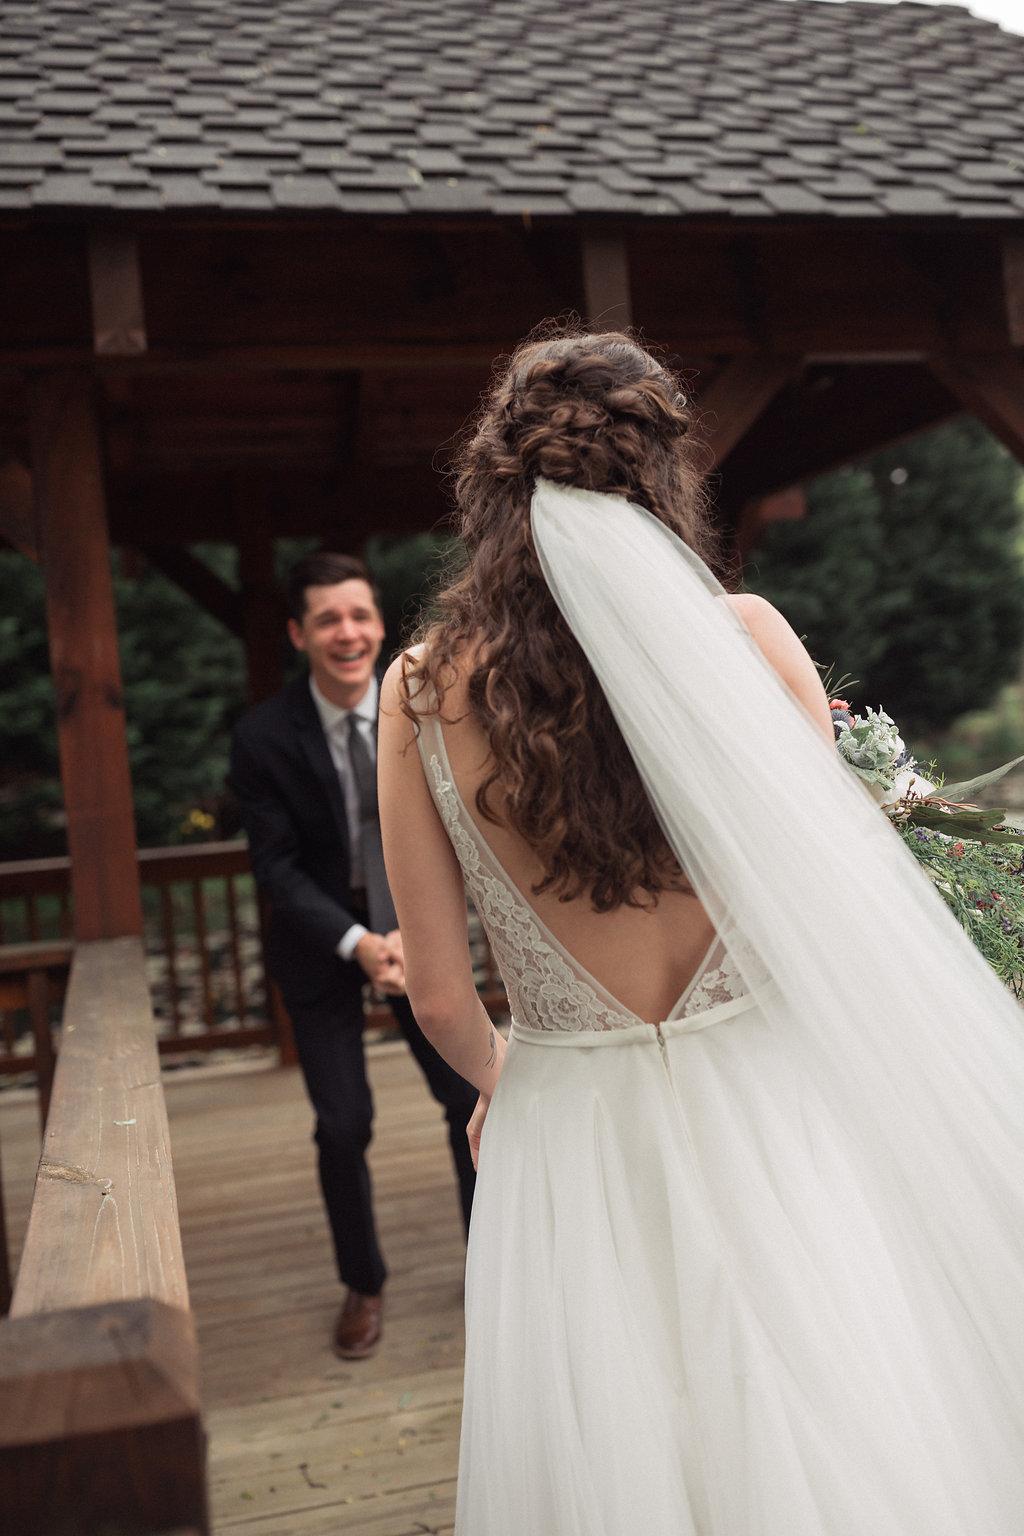 Honeysuckle-Hill-Weddings-Mallory-Patrick-59.jpg